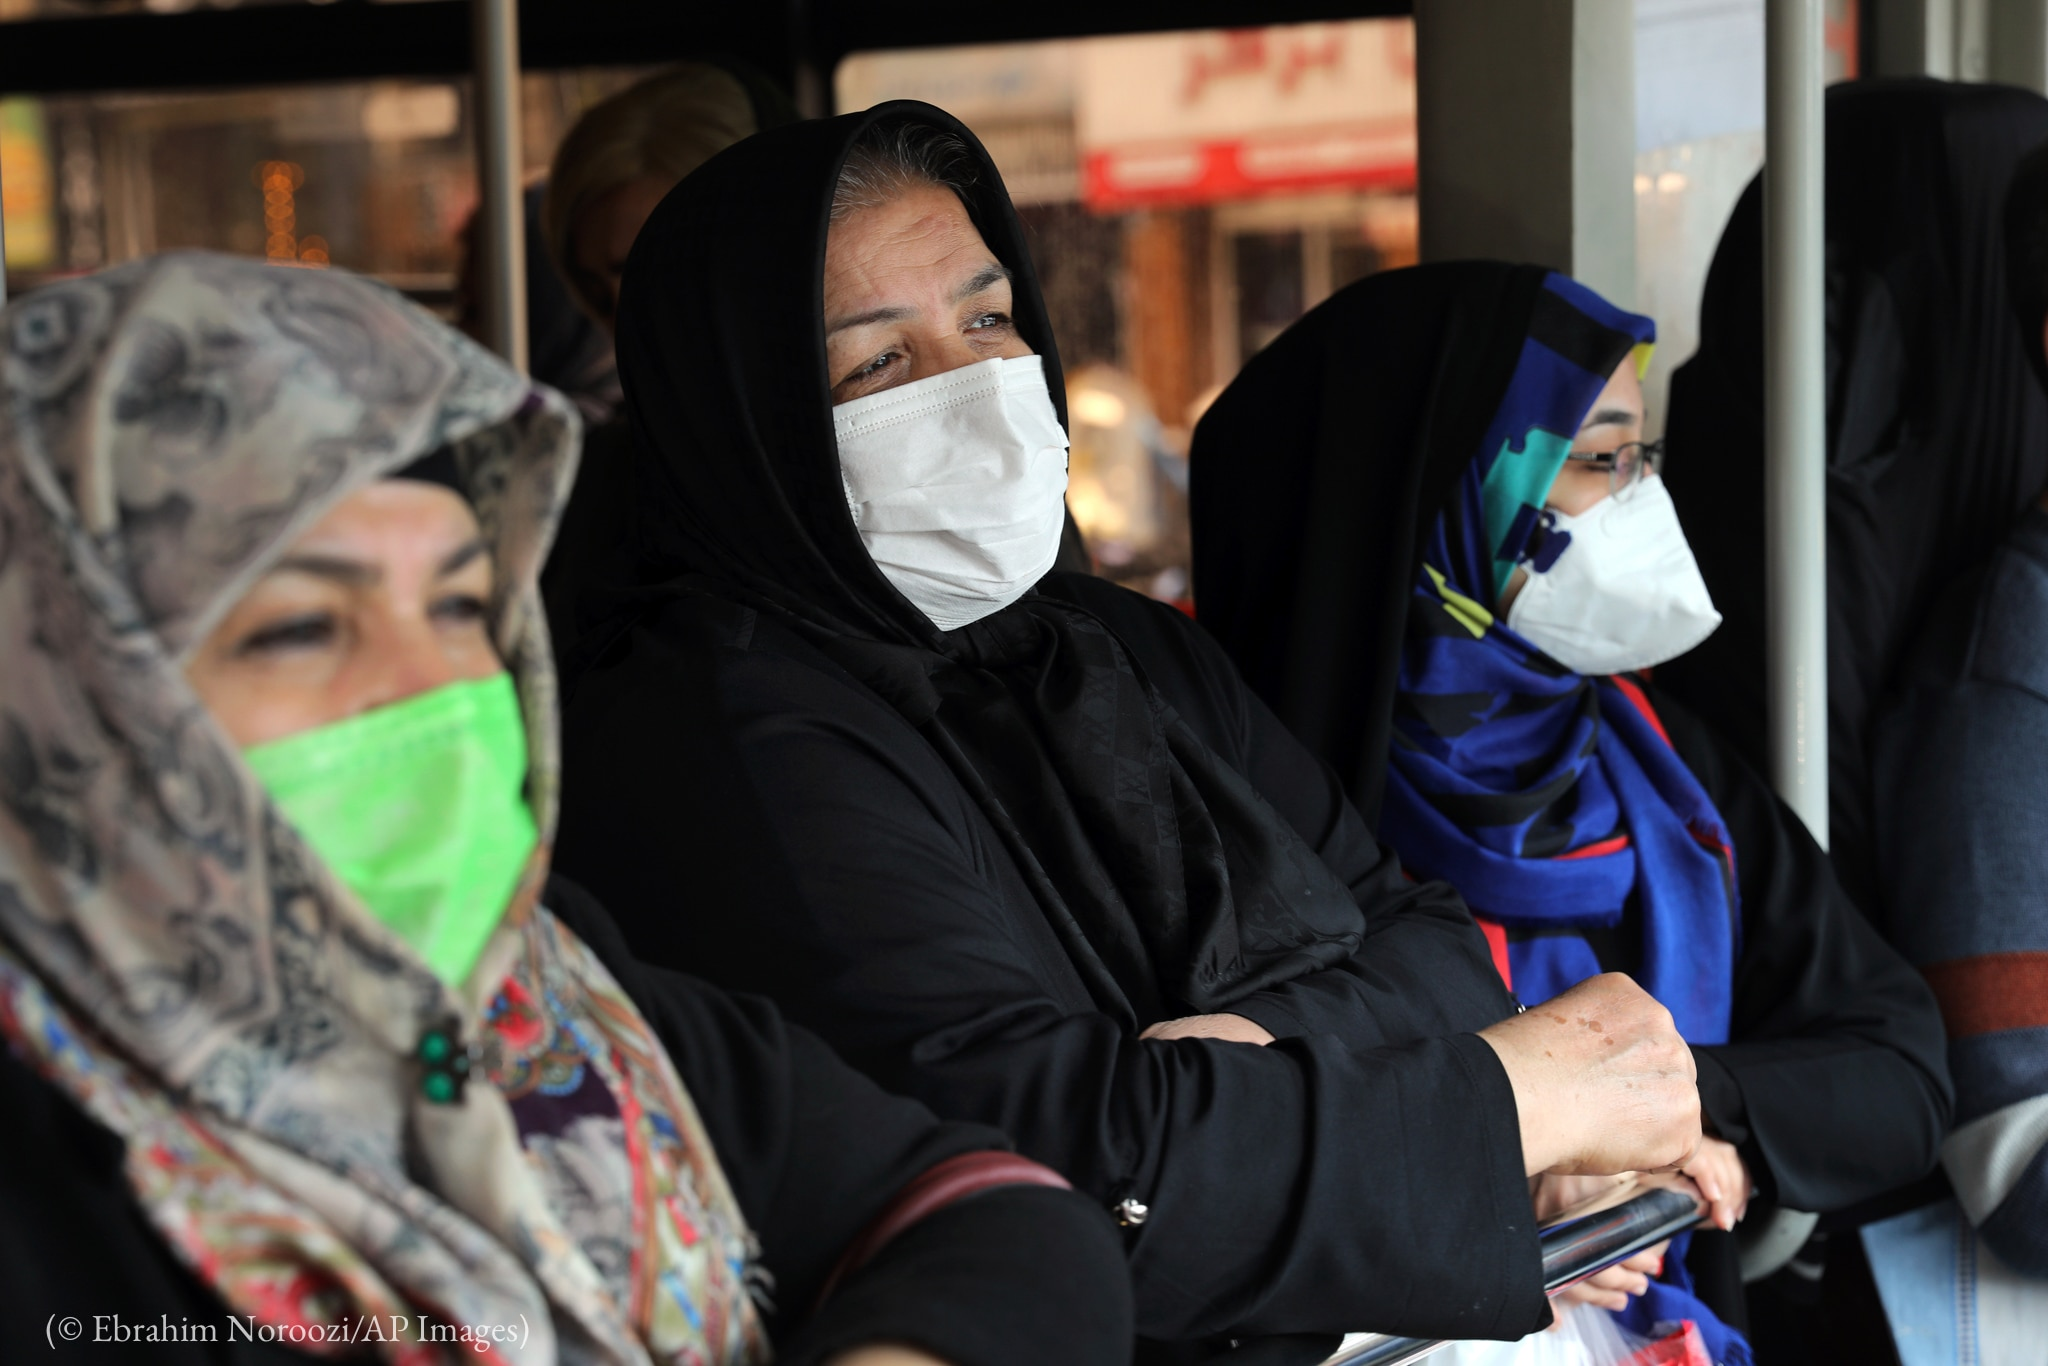 Mujeres con máscaras para cirugía (© Ebrahim Noroozi/AP Images)